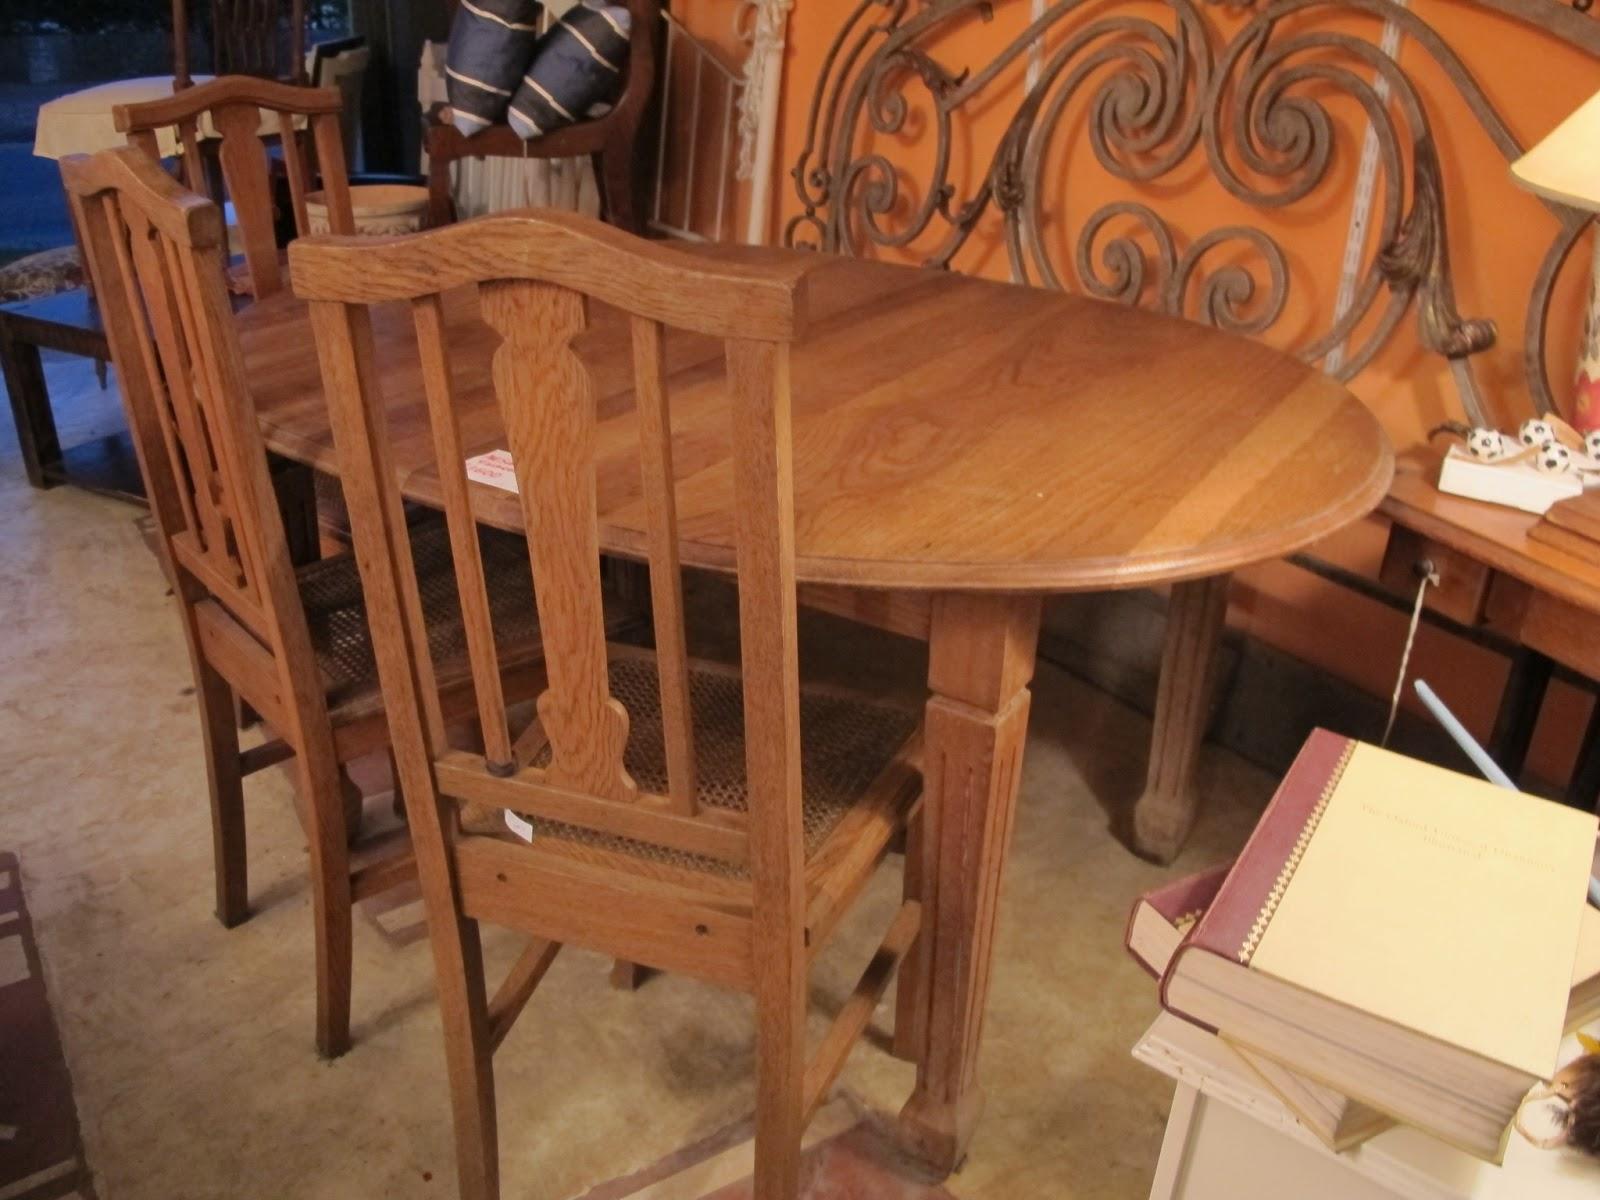 La guardilla flea market style muebles comedor for Sillas comedor roble